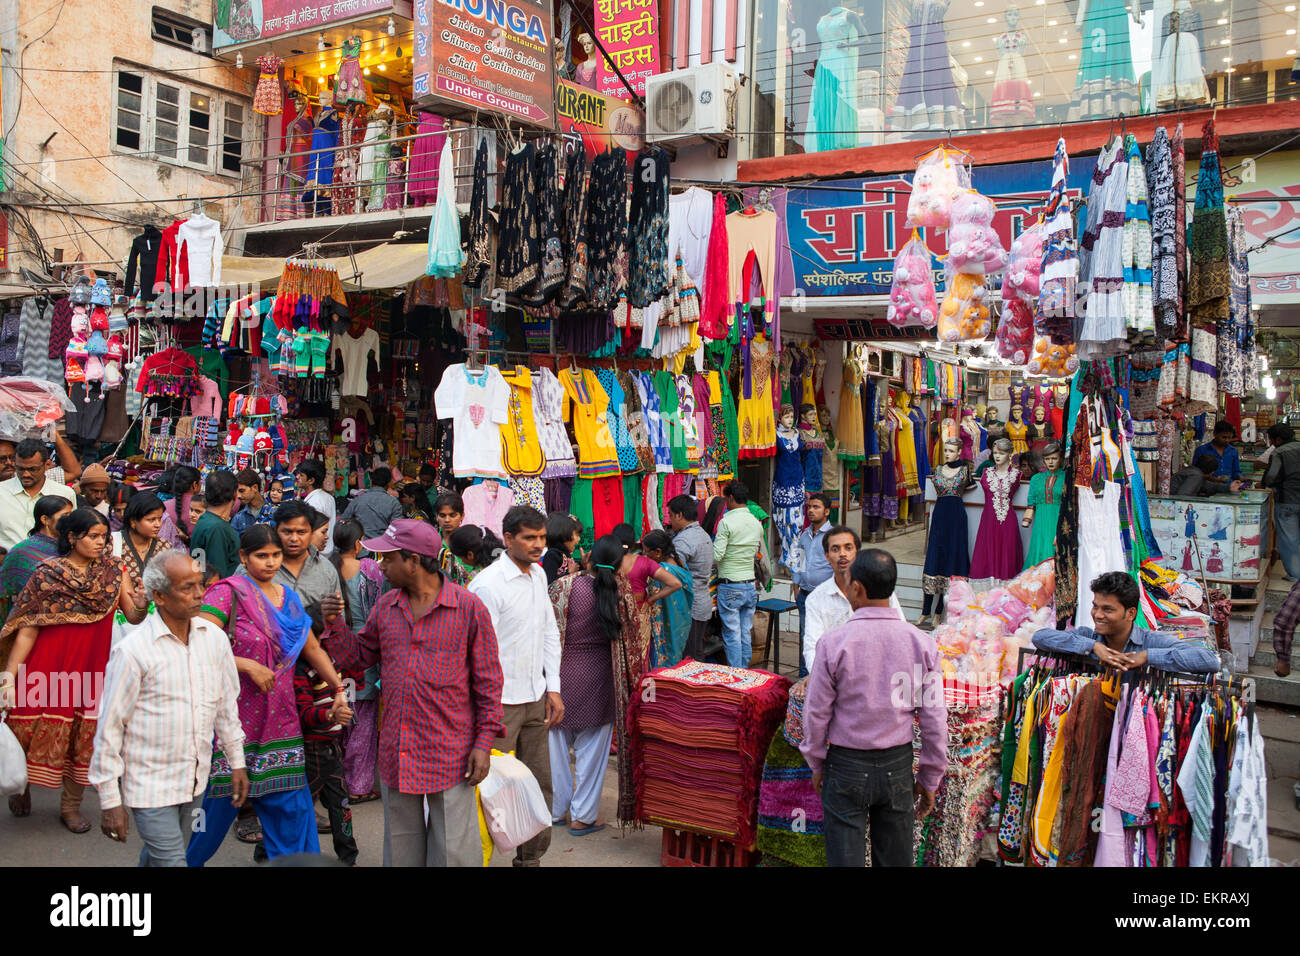 Vêtements et magasins sur Dashaswmedh Ghat Road à Varanasi Photo Stock